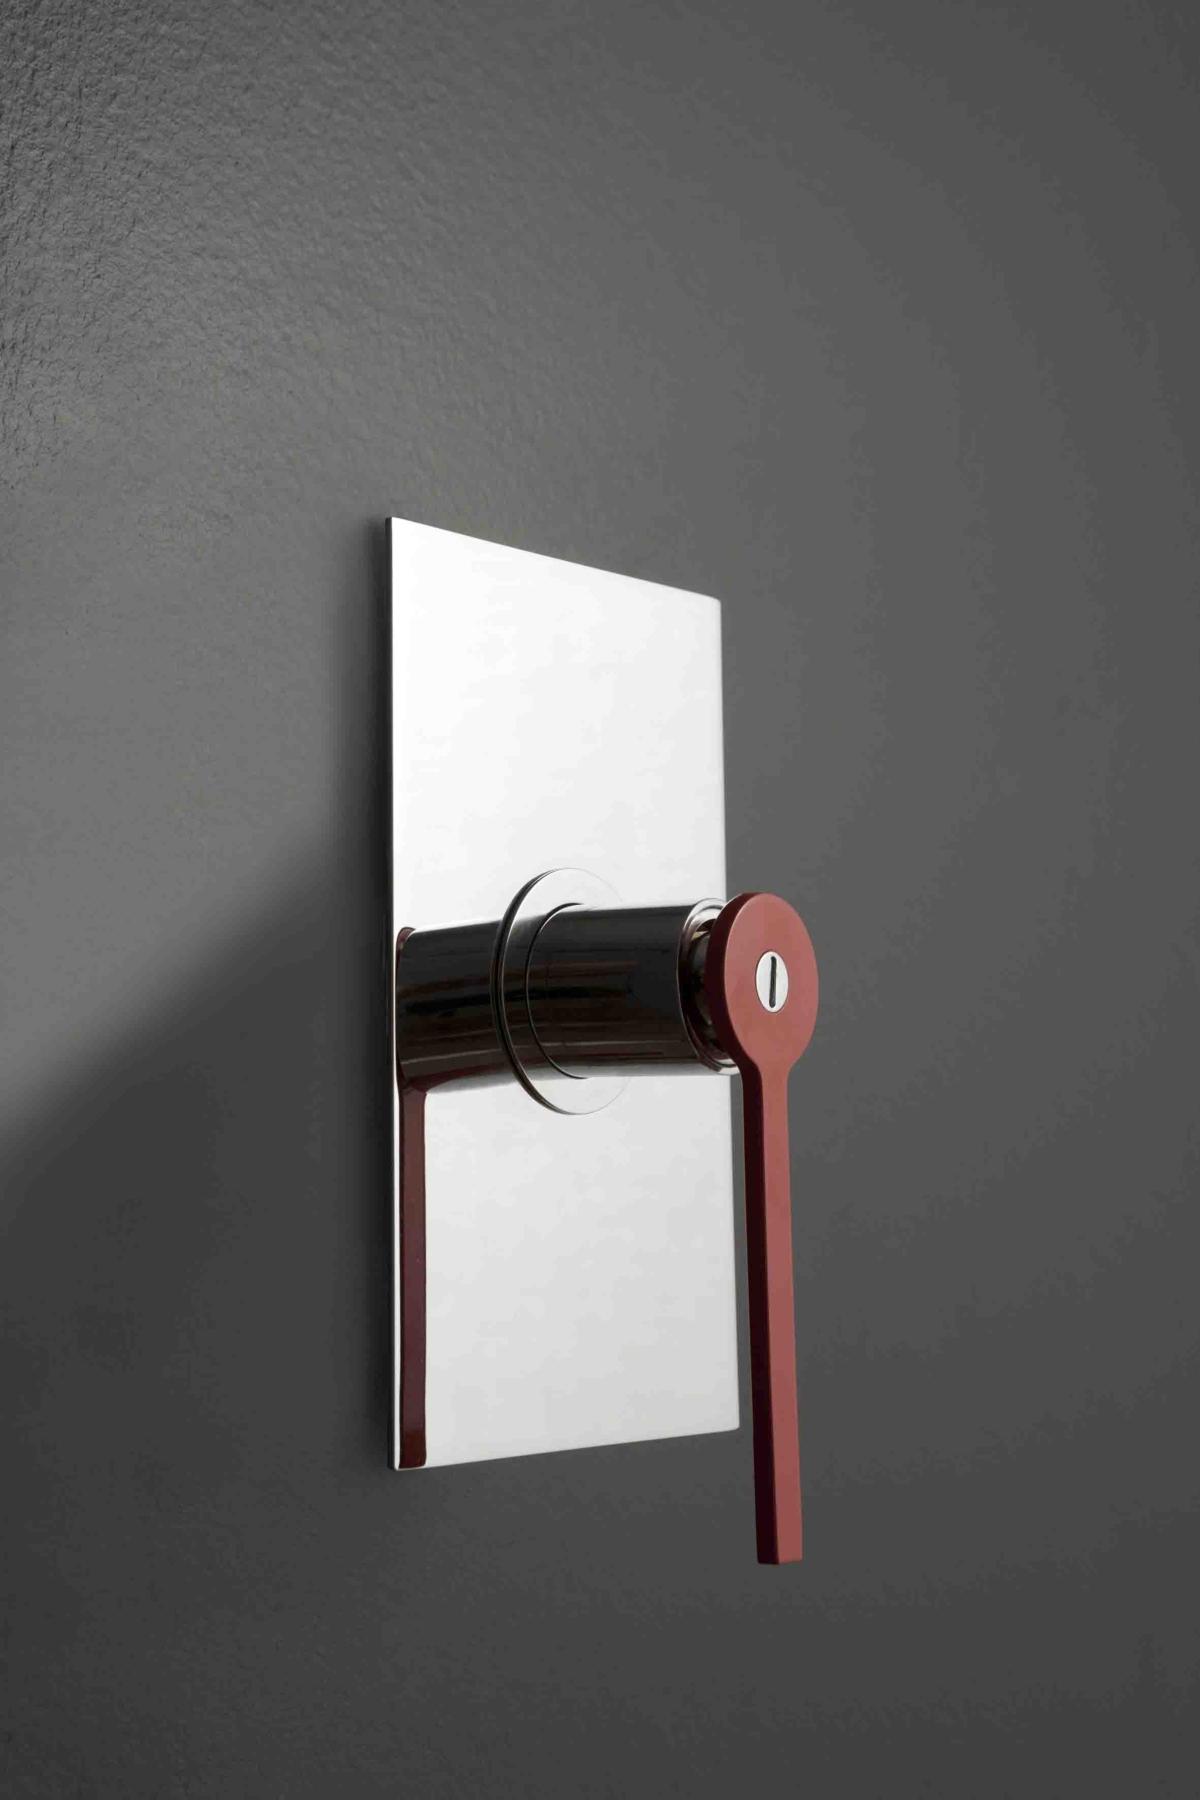 Treemme Rubinetterie Tiempo de diseño de la serie Marco Pisano